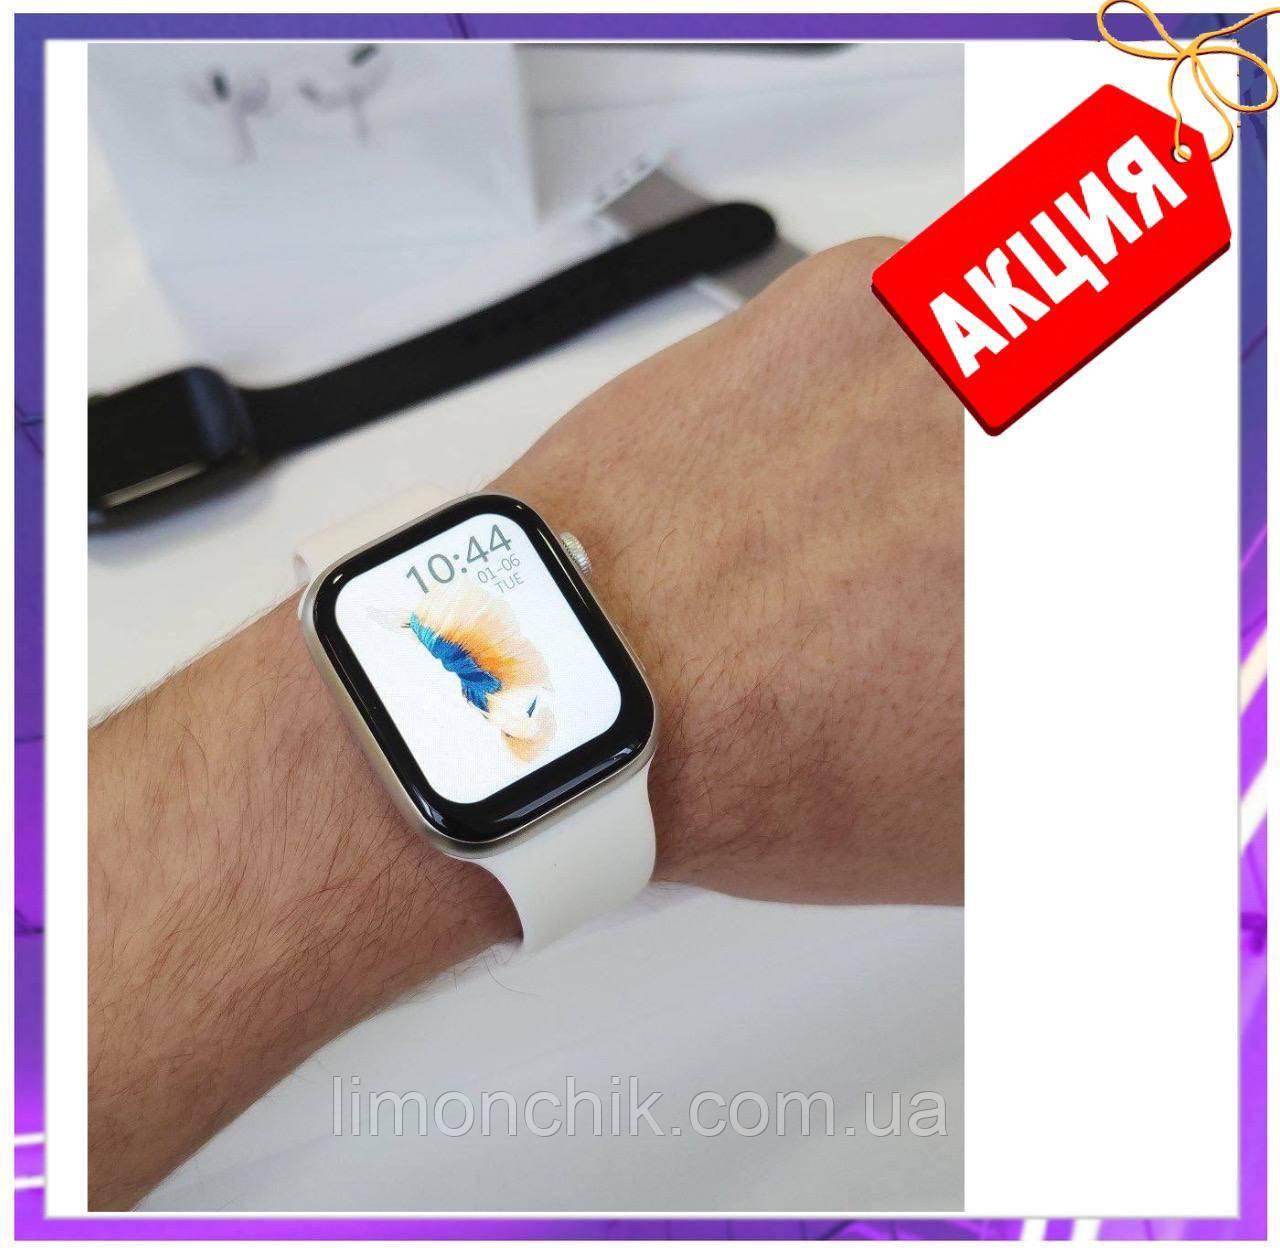 Умные смарт часы Smart Watch FK-88 сенсорные наручные пульсометр шагометр фитнесс трекер белые